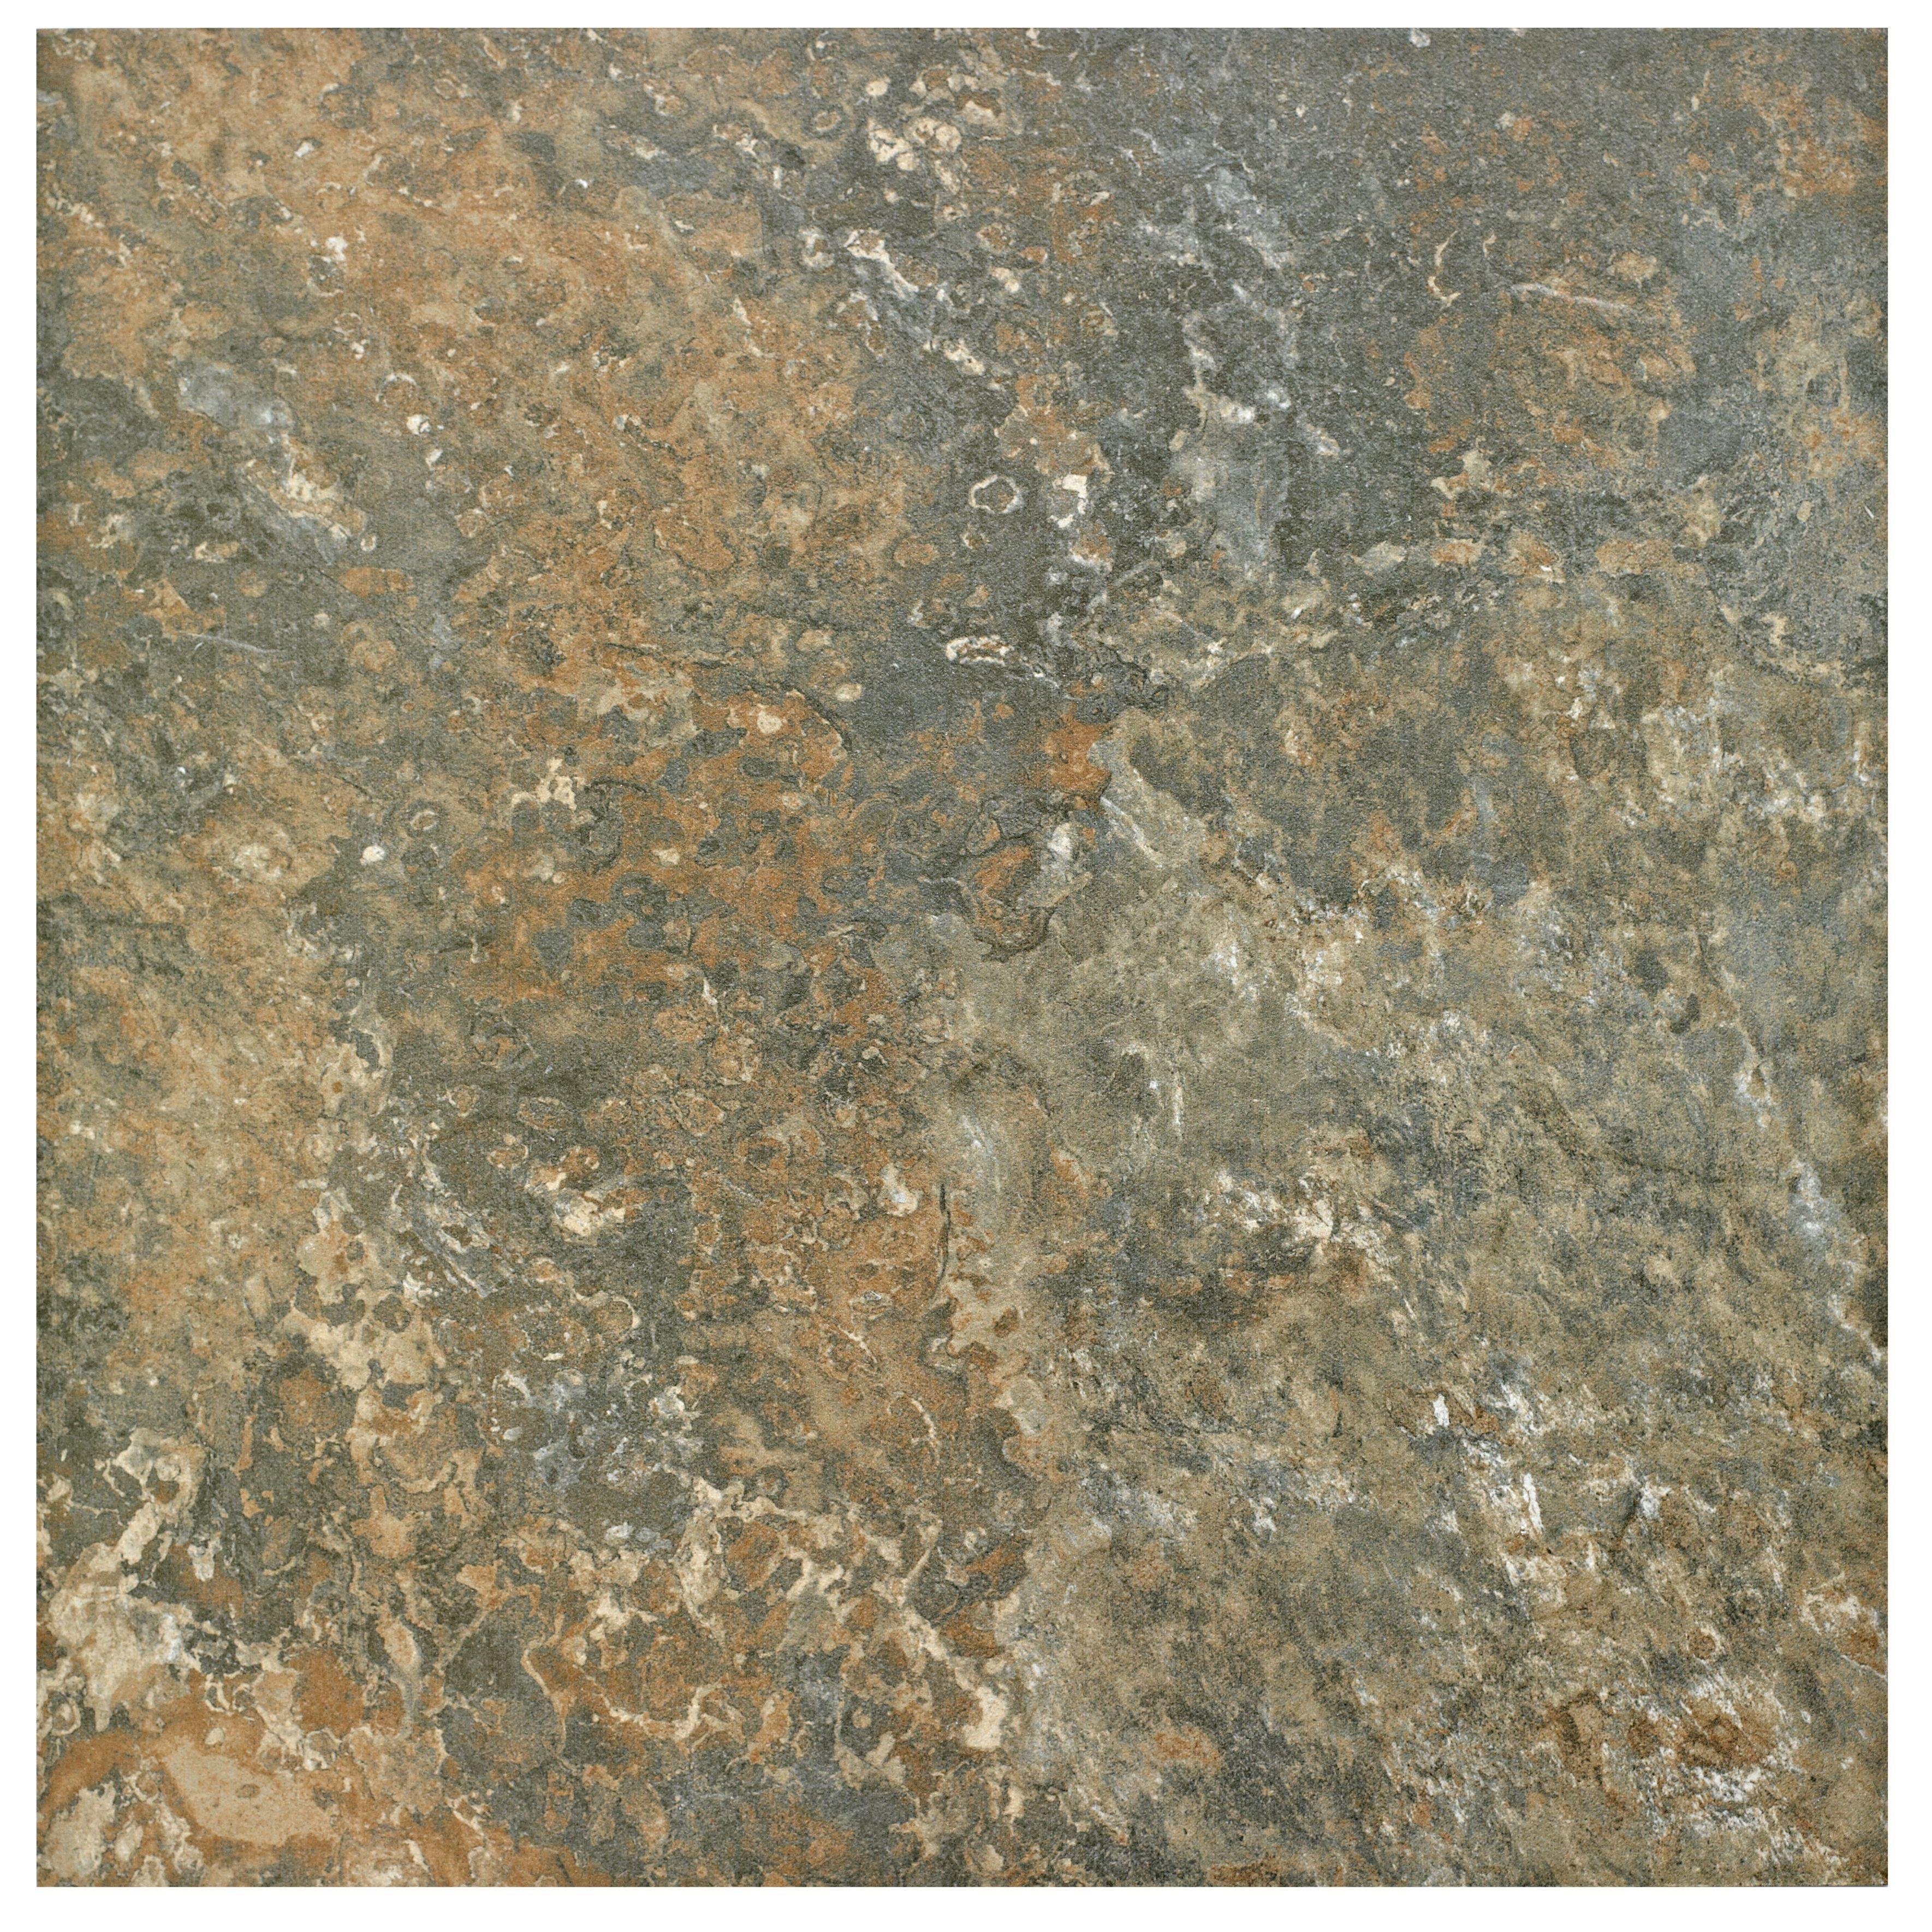 Brook Grey Dark Stone Effect Porcelain Wall & Floor Tile,